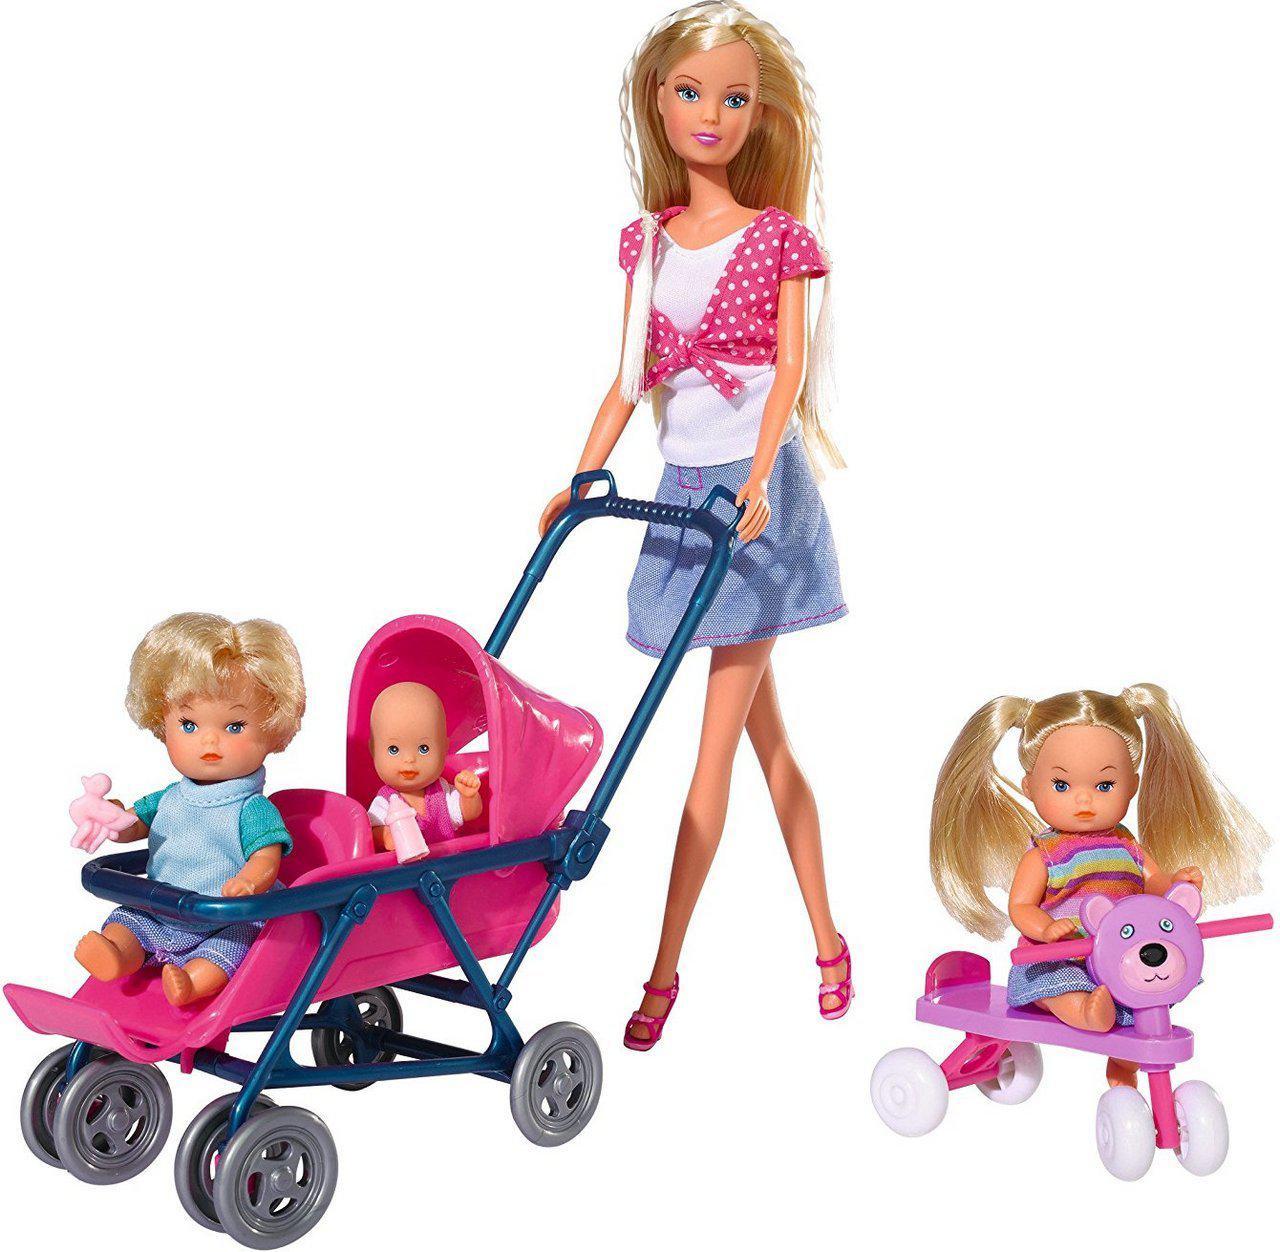 Кукла Штеффи с детьми и аксессуарами 5736350